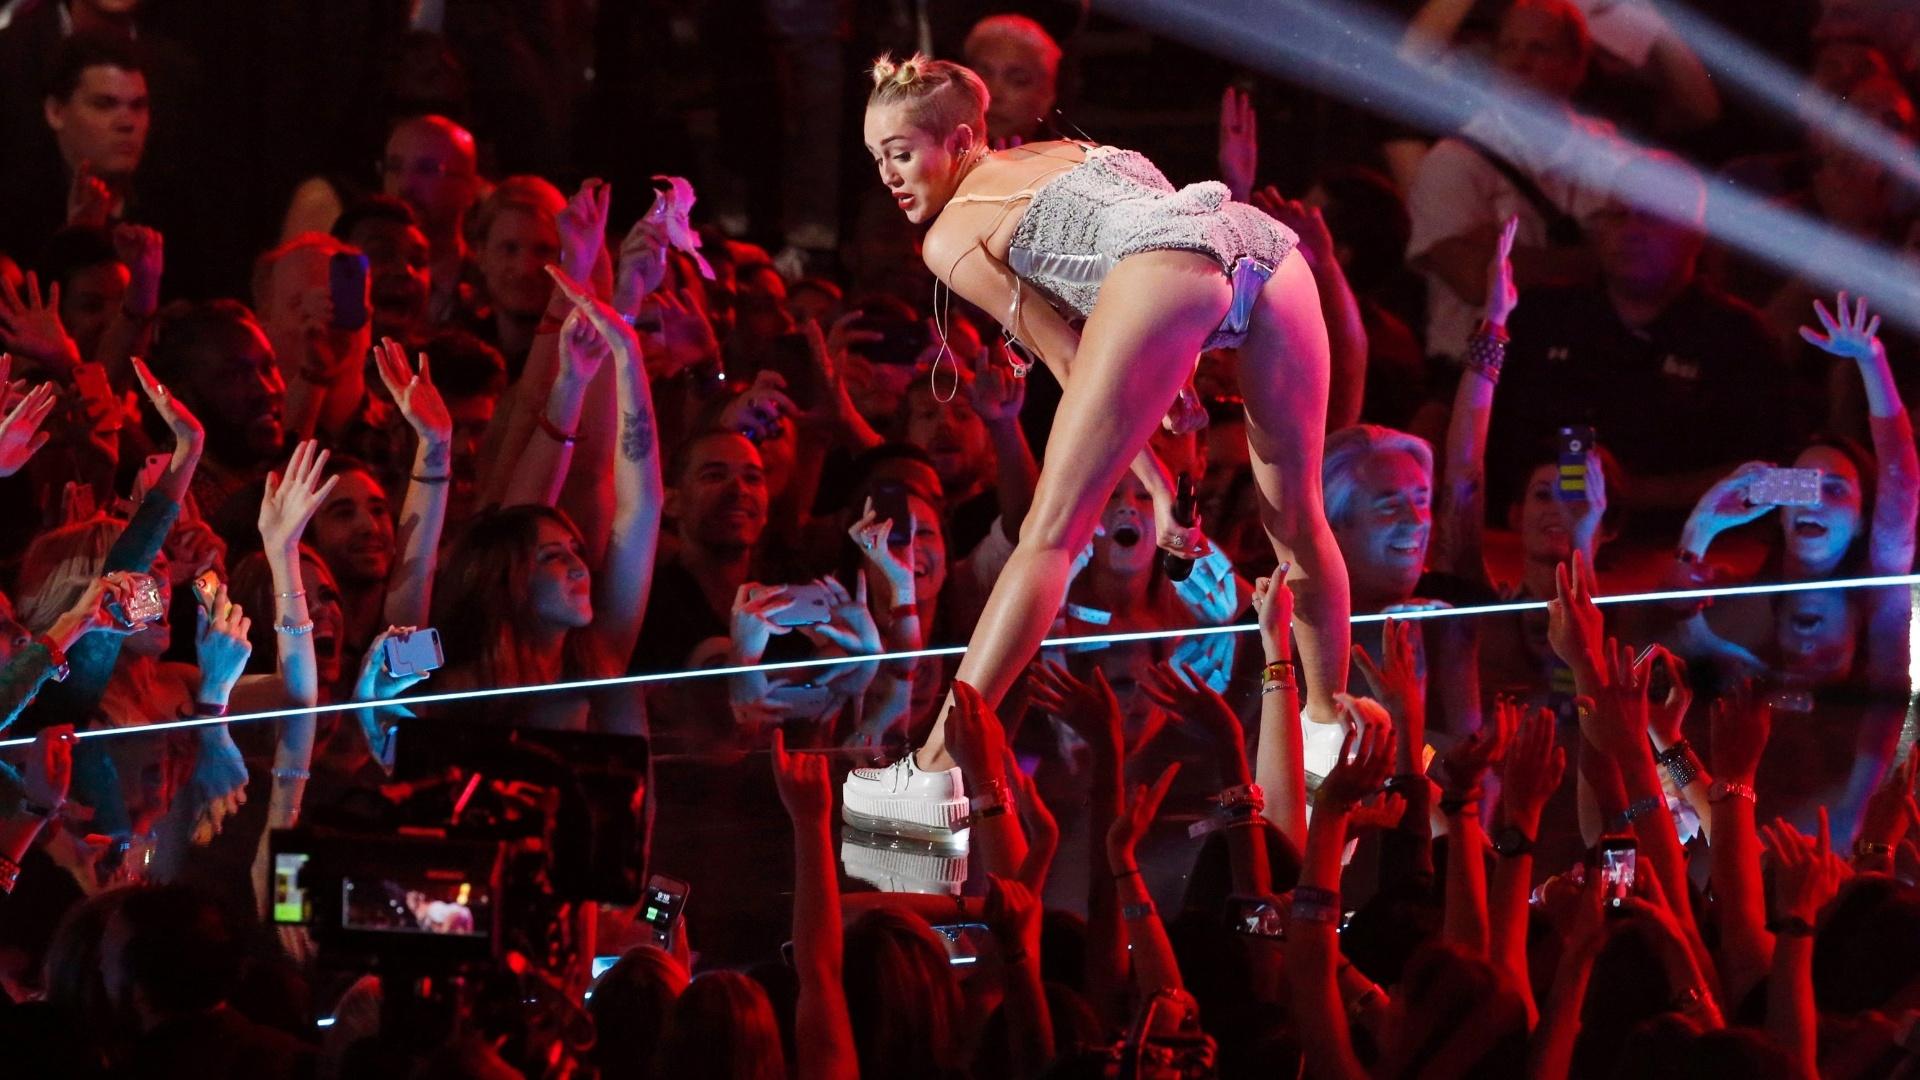 25.ago.2013 - Miley Cyrus canta